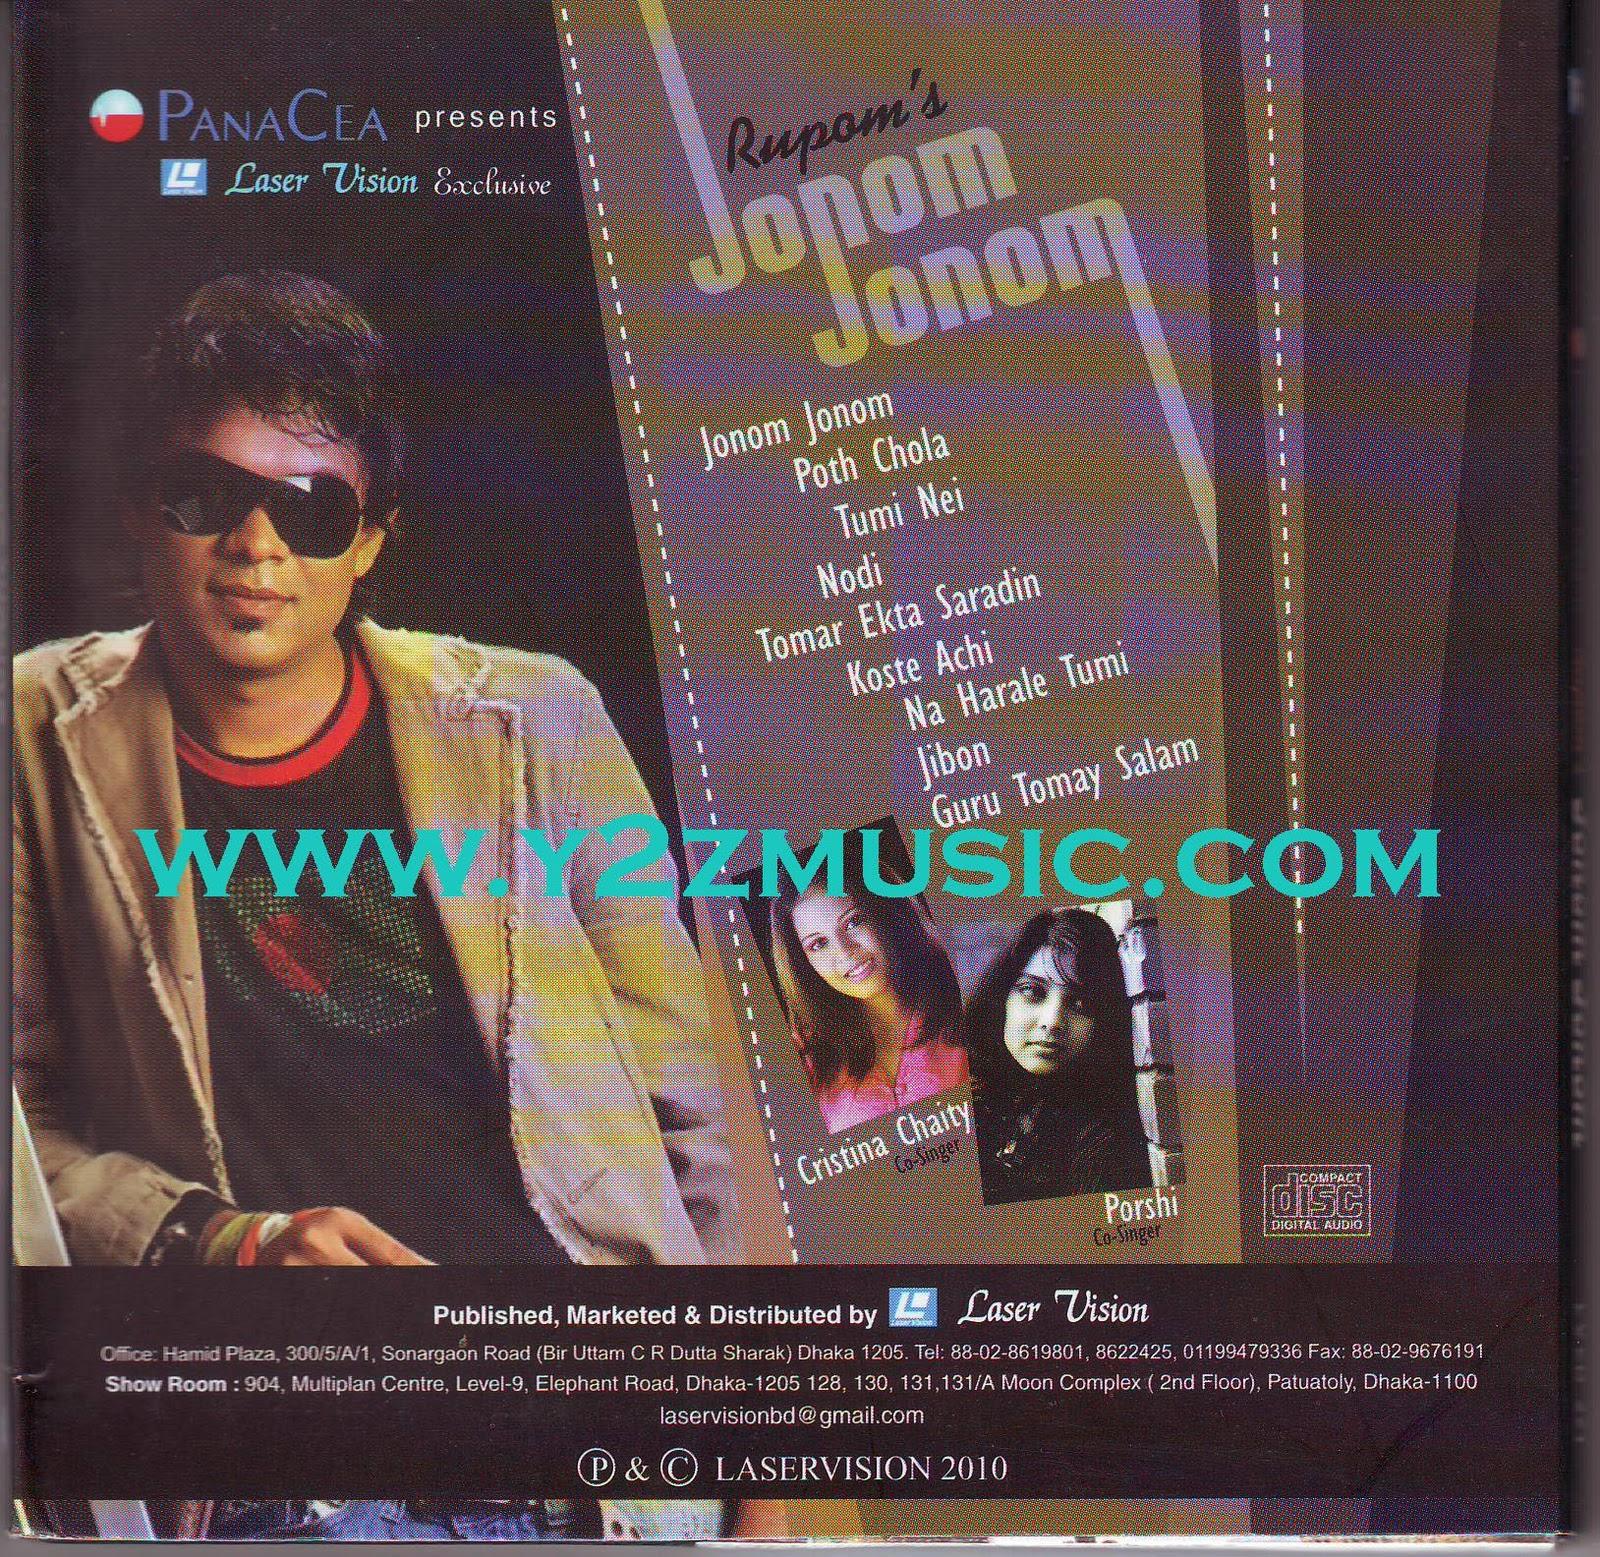 Ami Ki Tomay Songs Download: Music2gather: November 2010